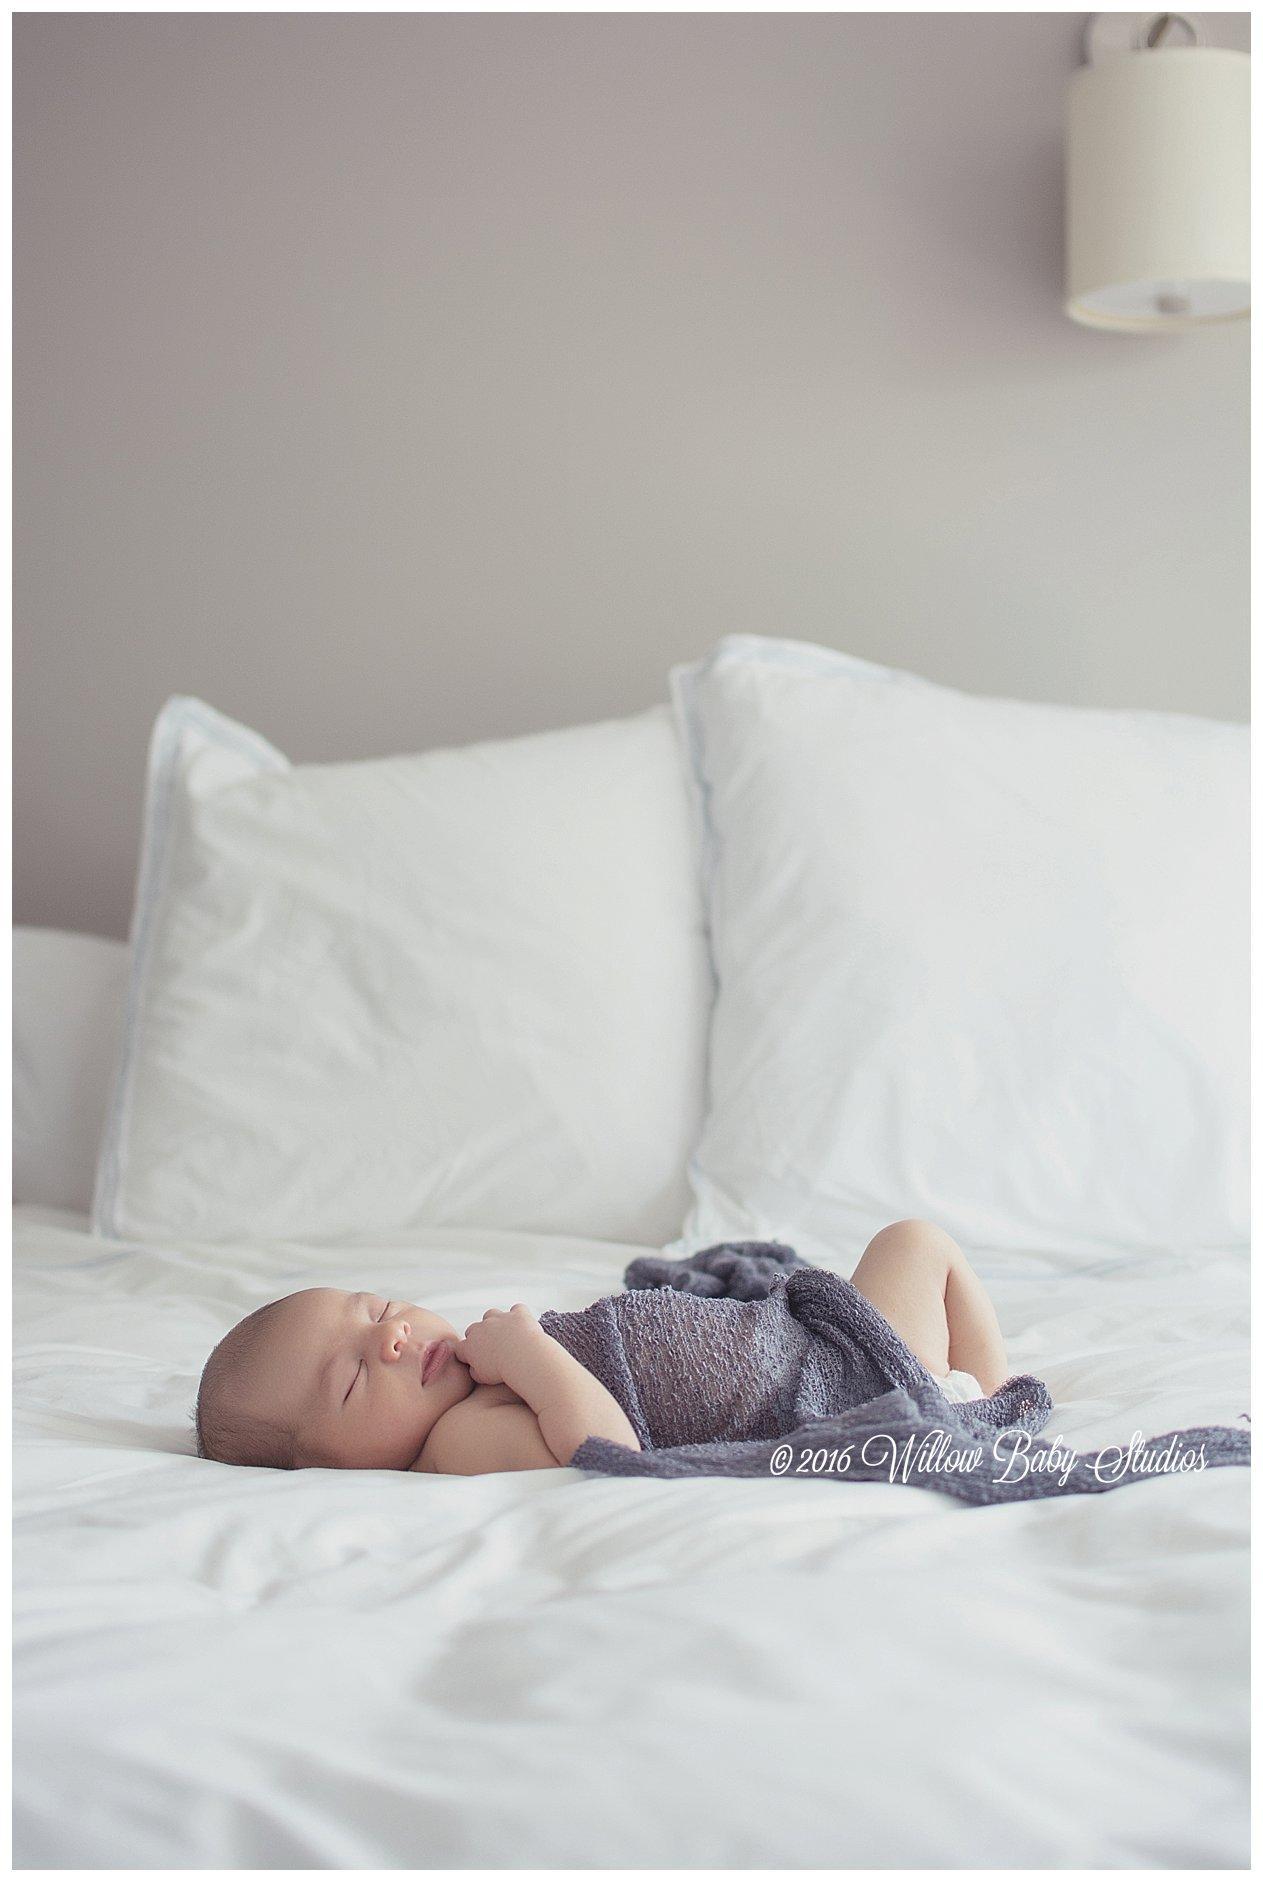 newborn-sleeping-alone-on-parent's-bed